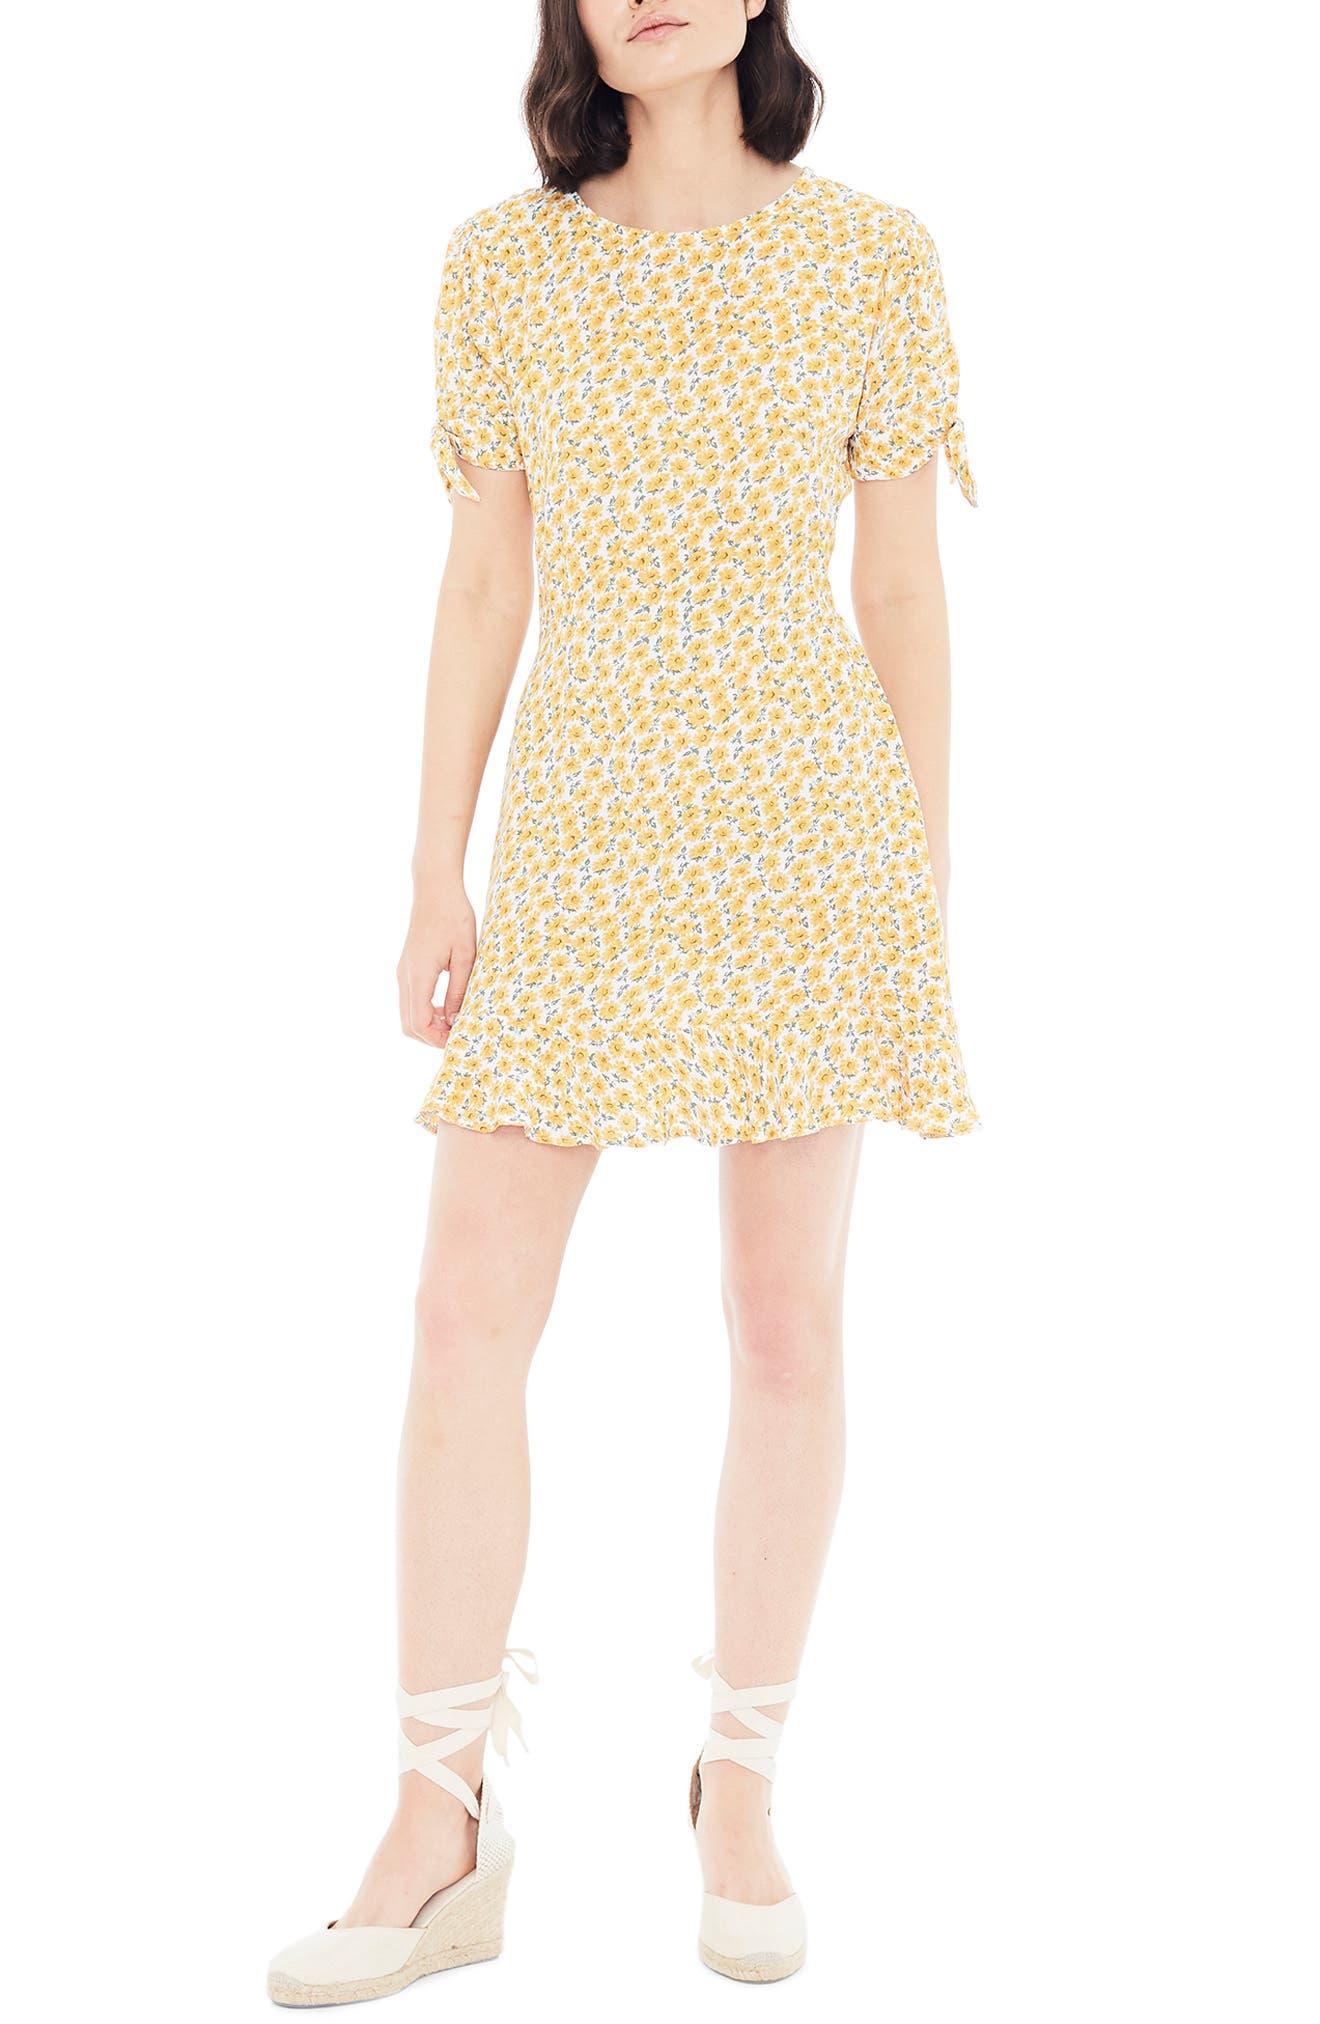 Faithfull The Brand Daphne Tie Sleeve Minidress, Yellow